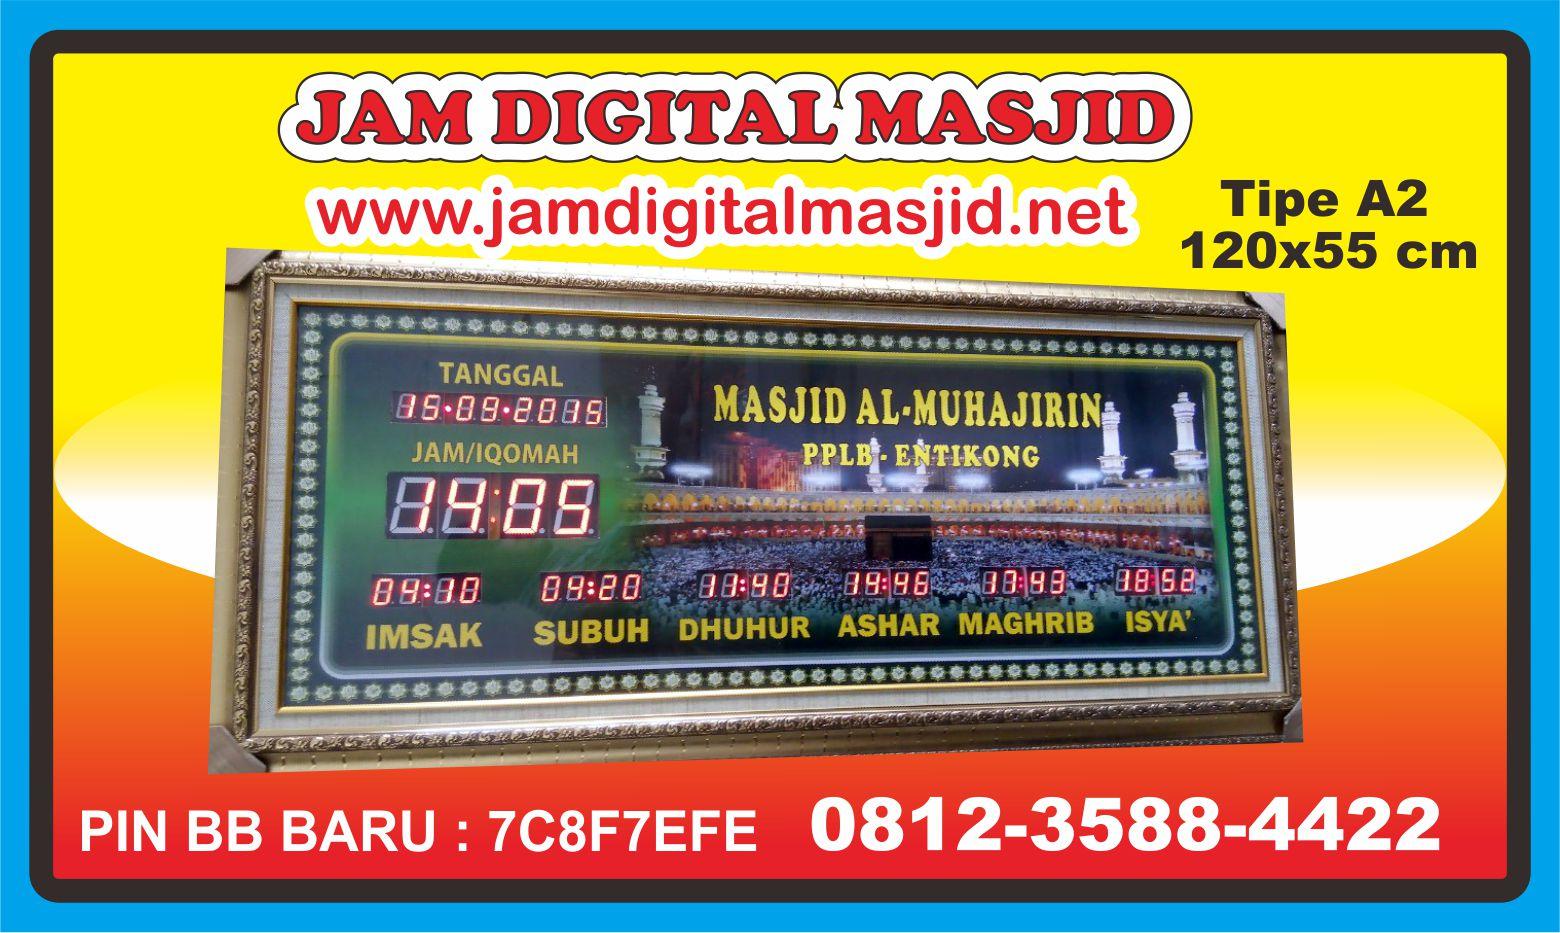 jam-digital-masjid-almuhajirin-entikong-kalimantan